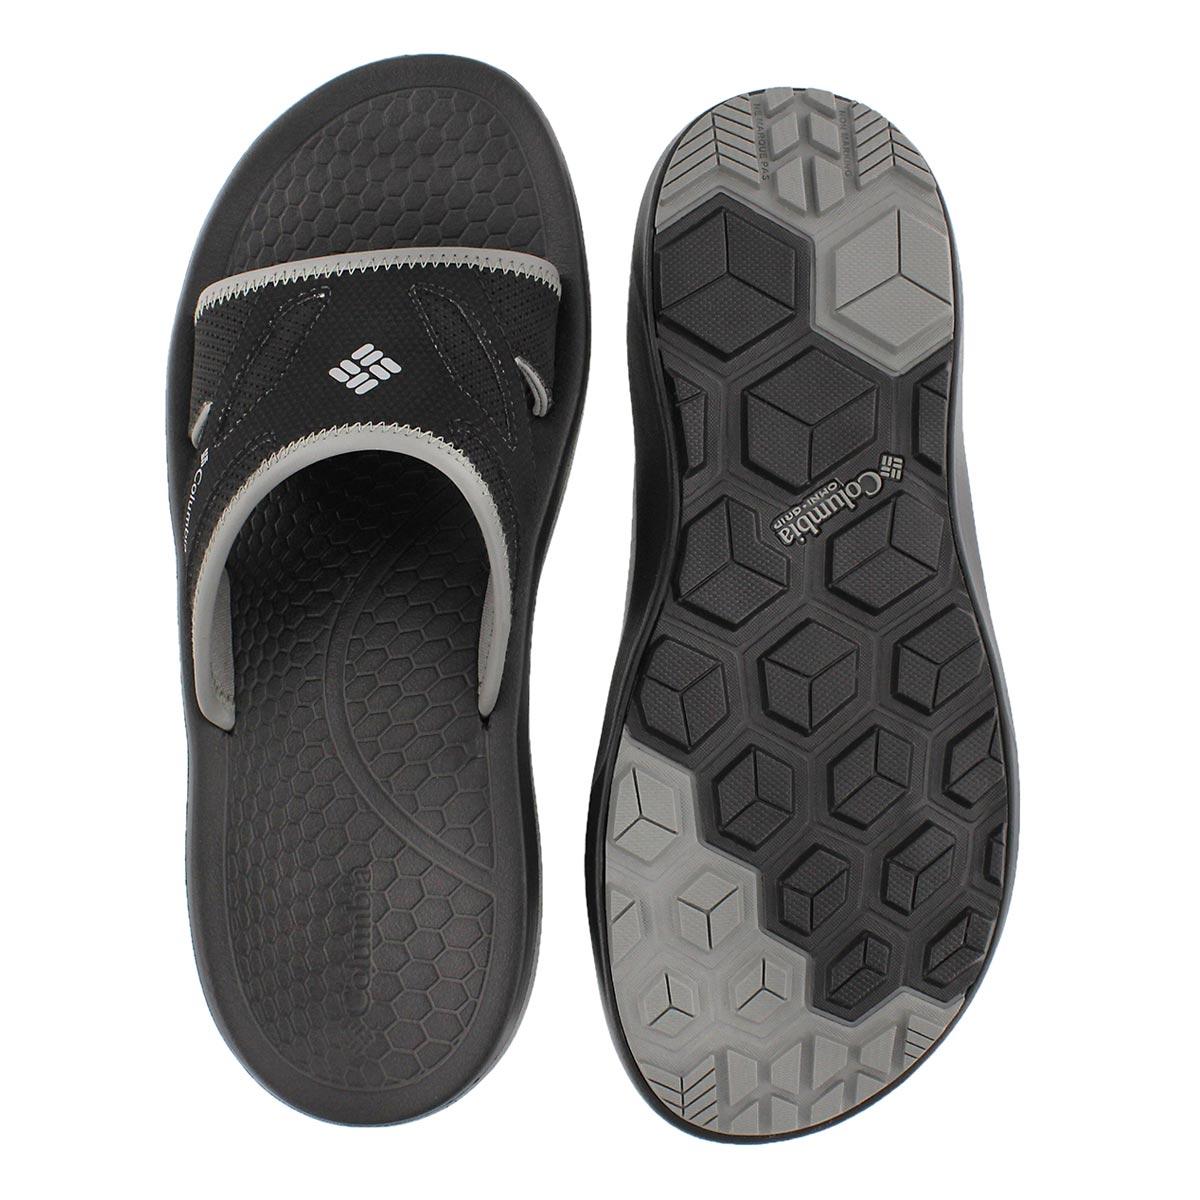 Mns Techsun Slide black casual sandal